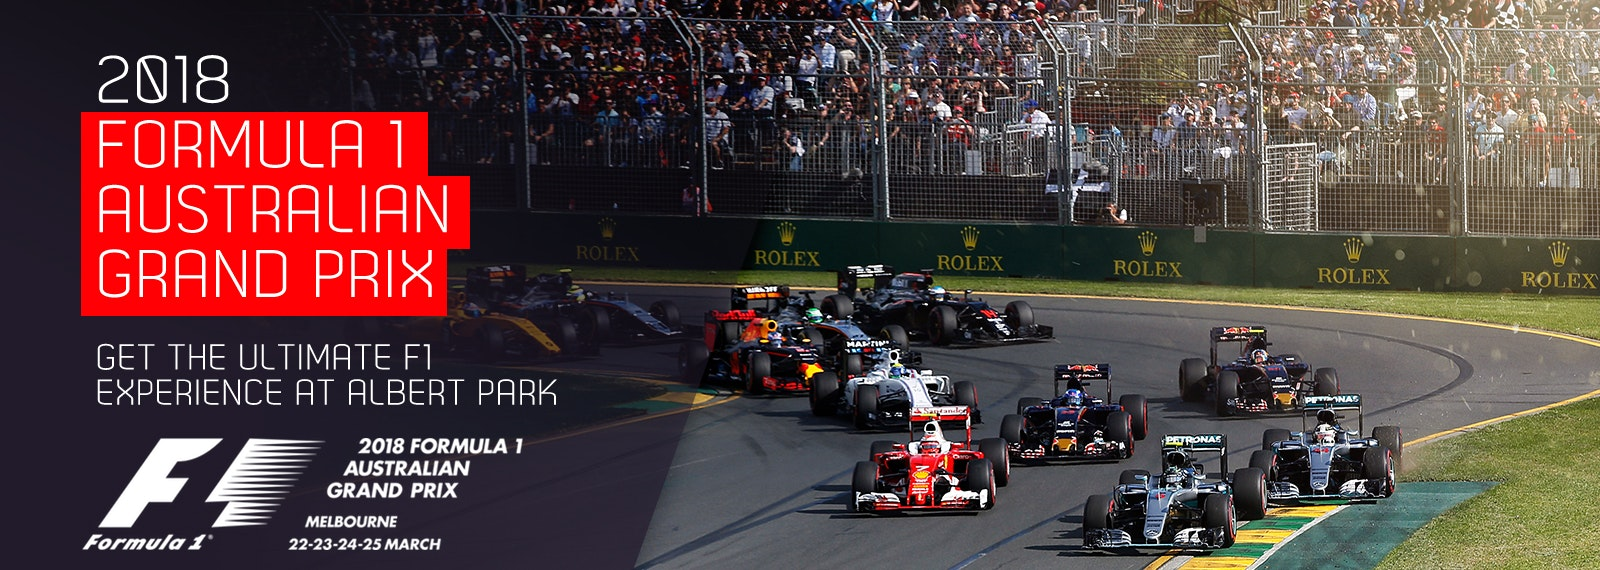 2018 Formula 1 Australian Grand Prix Melbourne Free Wifi